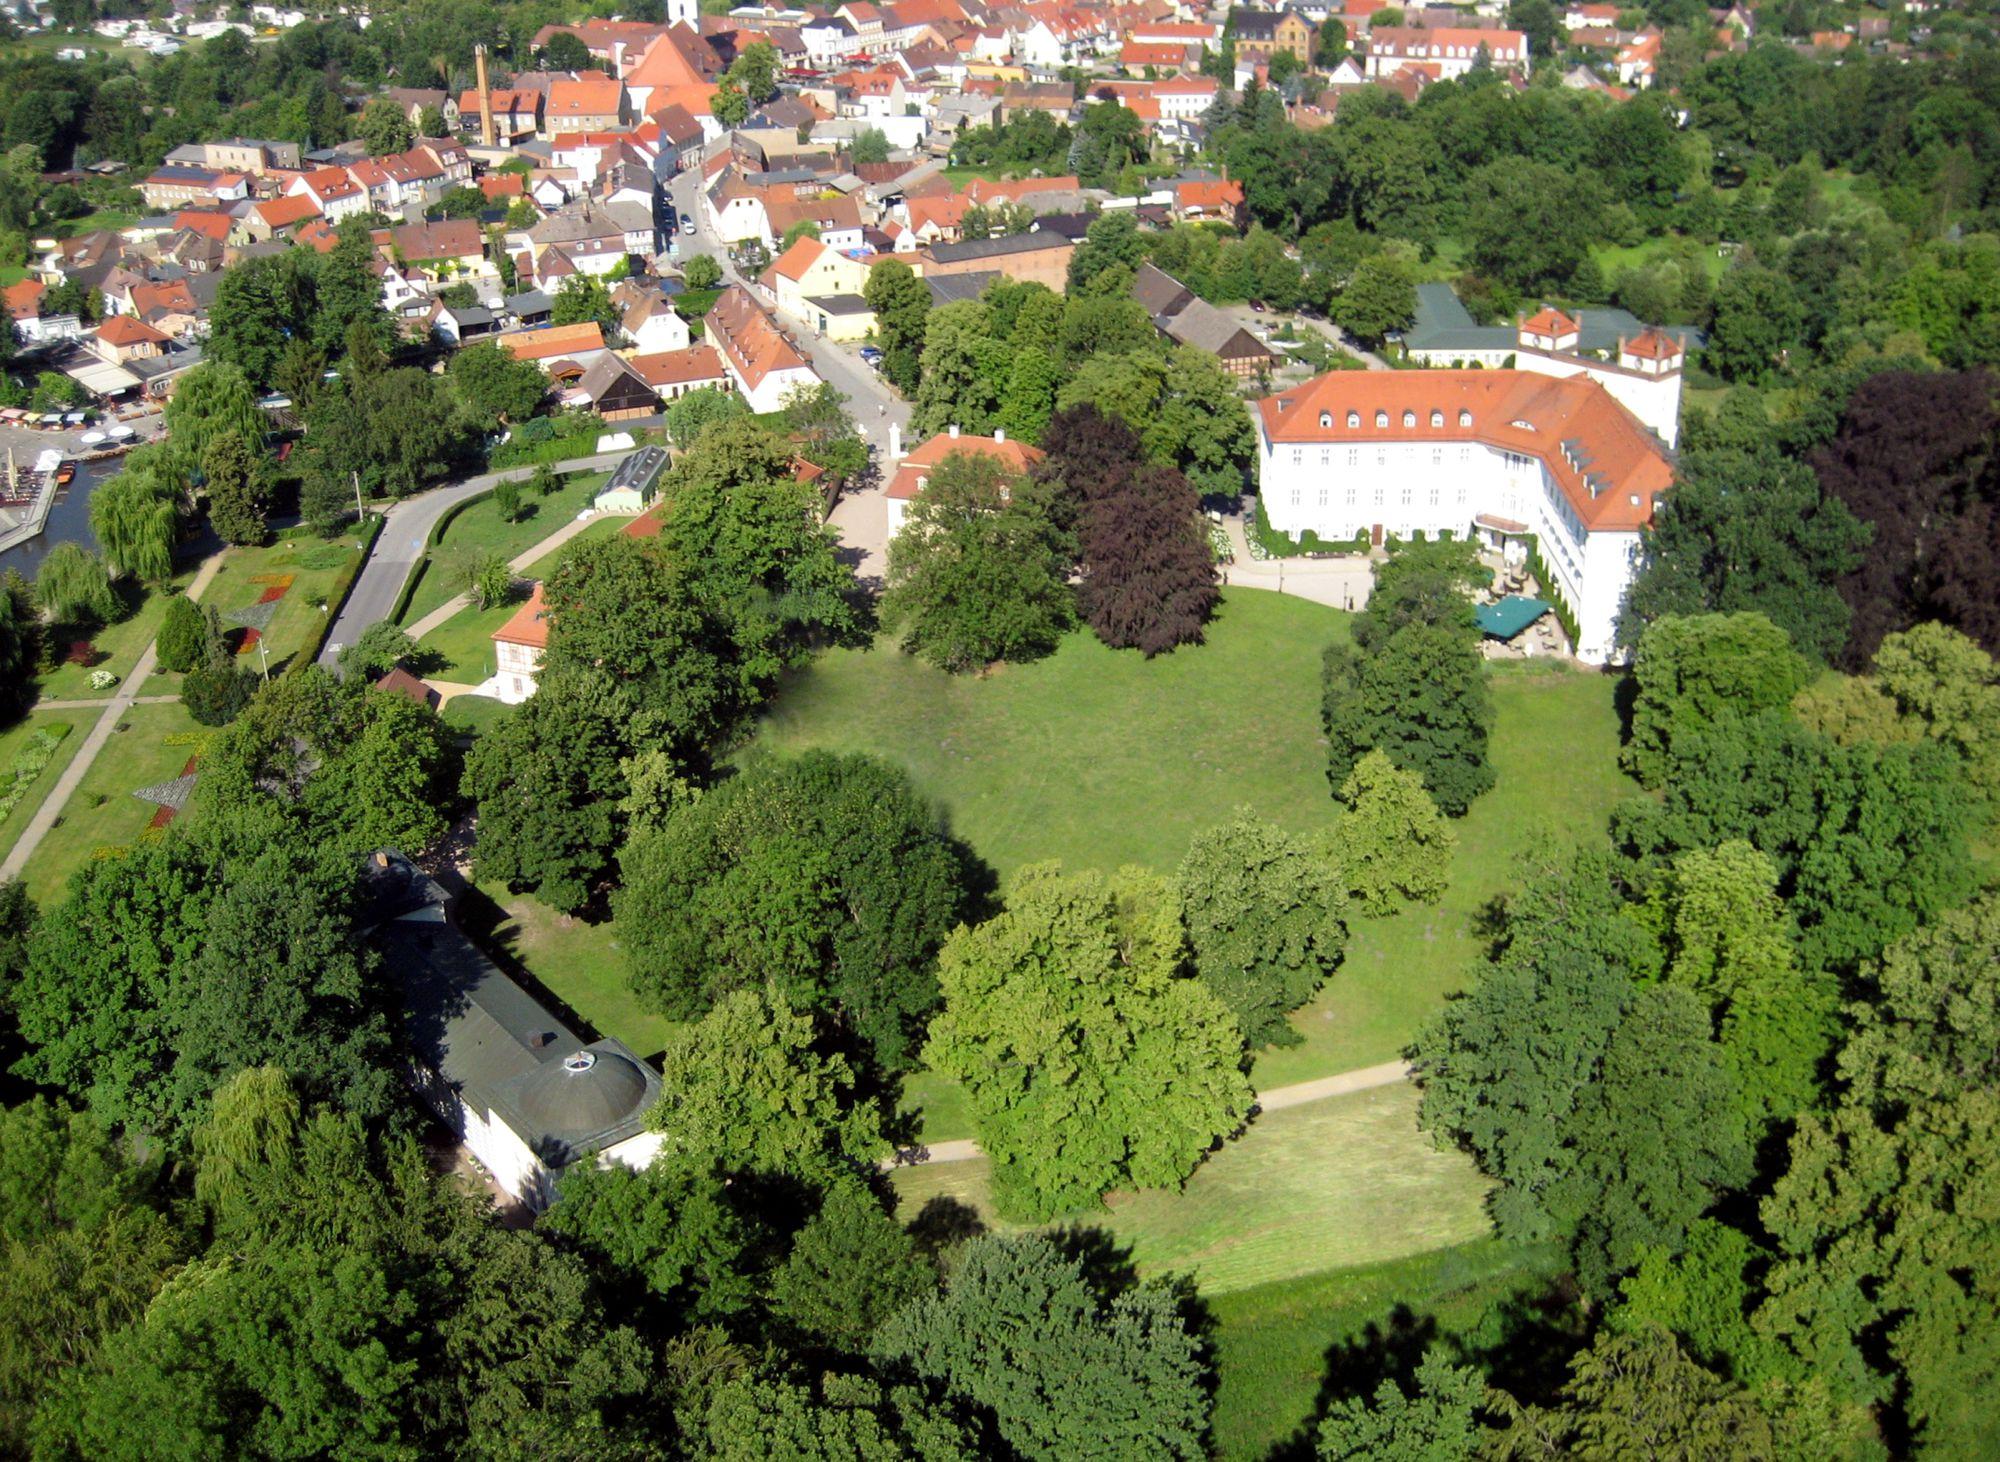 Urlaub Spreewald - Spreewald Arrangements - Spreewald erleben - Schloss Lübbenau im Spreewald